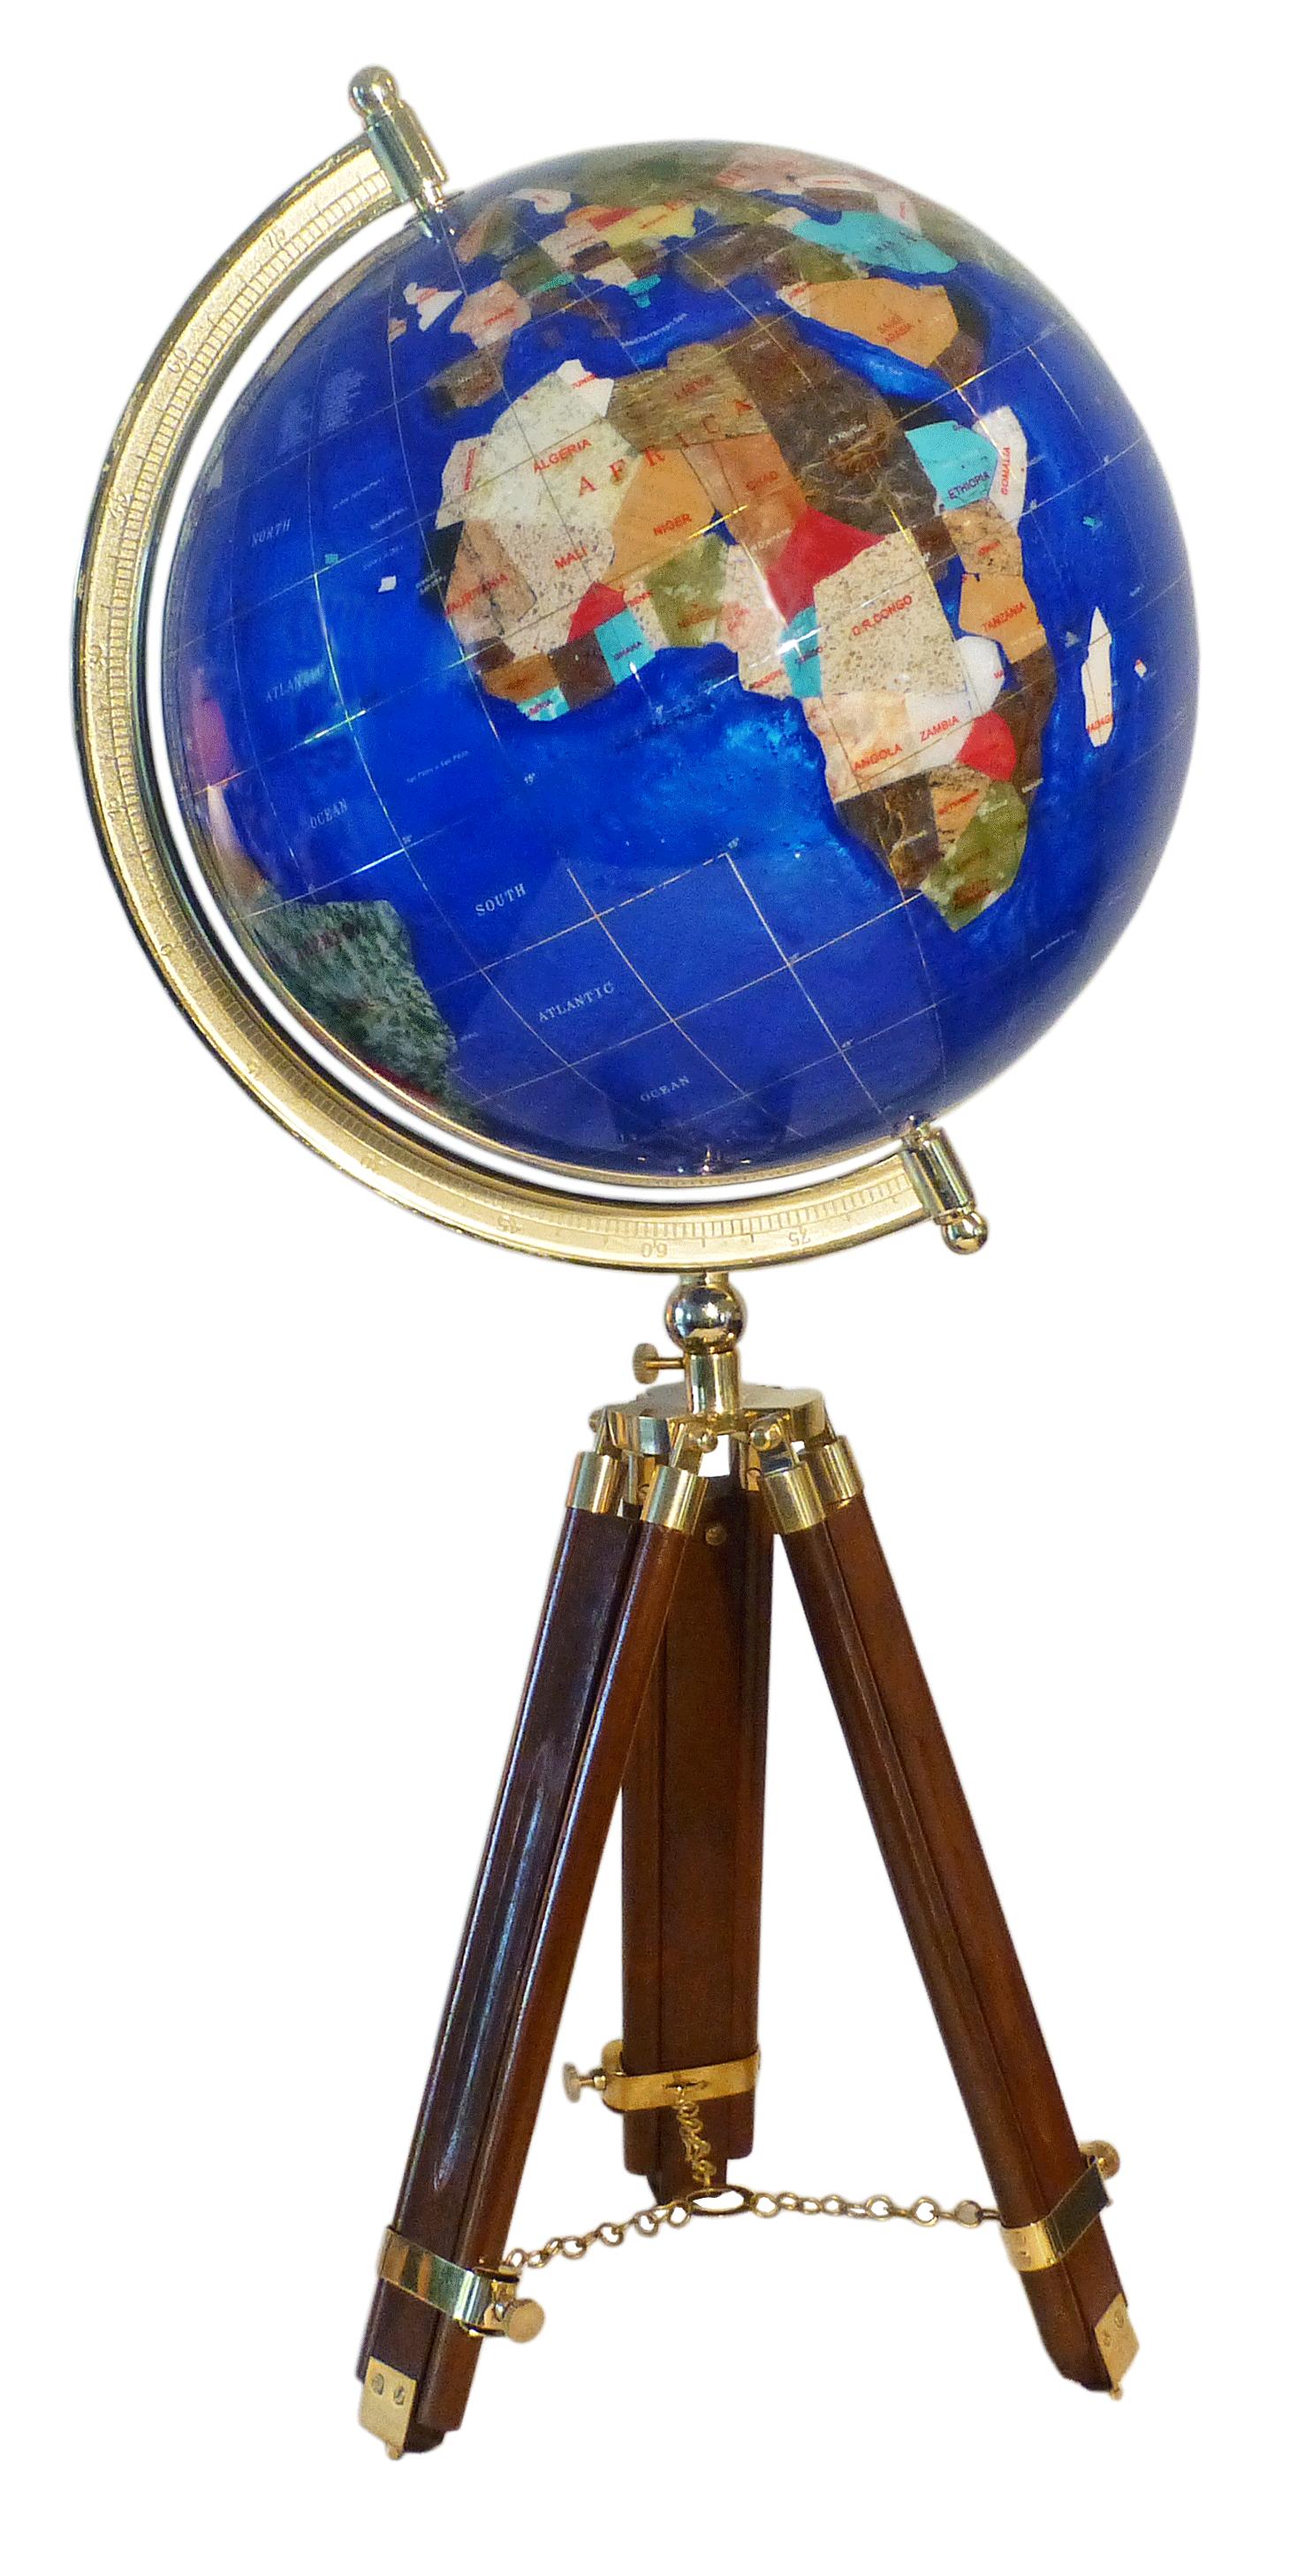 globe terrestre de bureau 33 cm bleu cambridge tr pied bois gemmoglobe 1pb 33 b bleu c. Black Bedroom Furniture Sets. Home Design Ideas